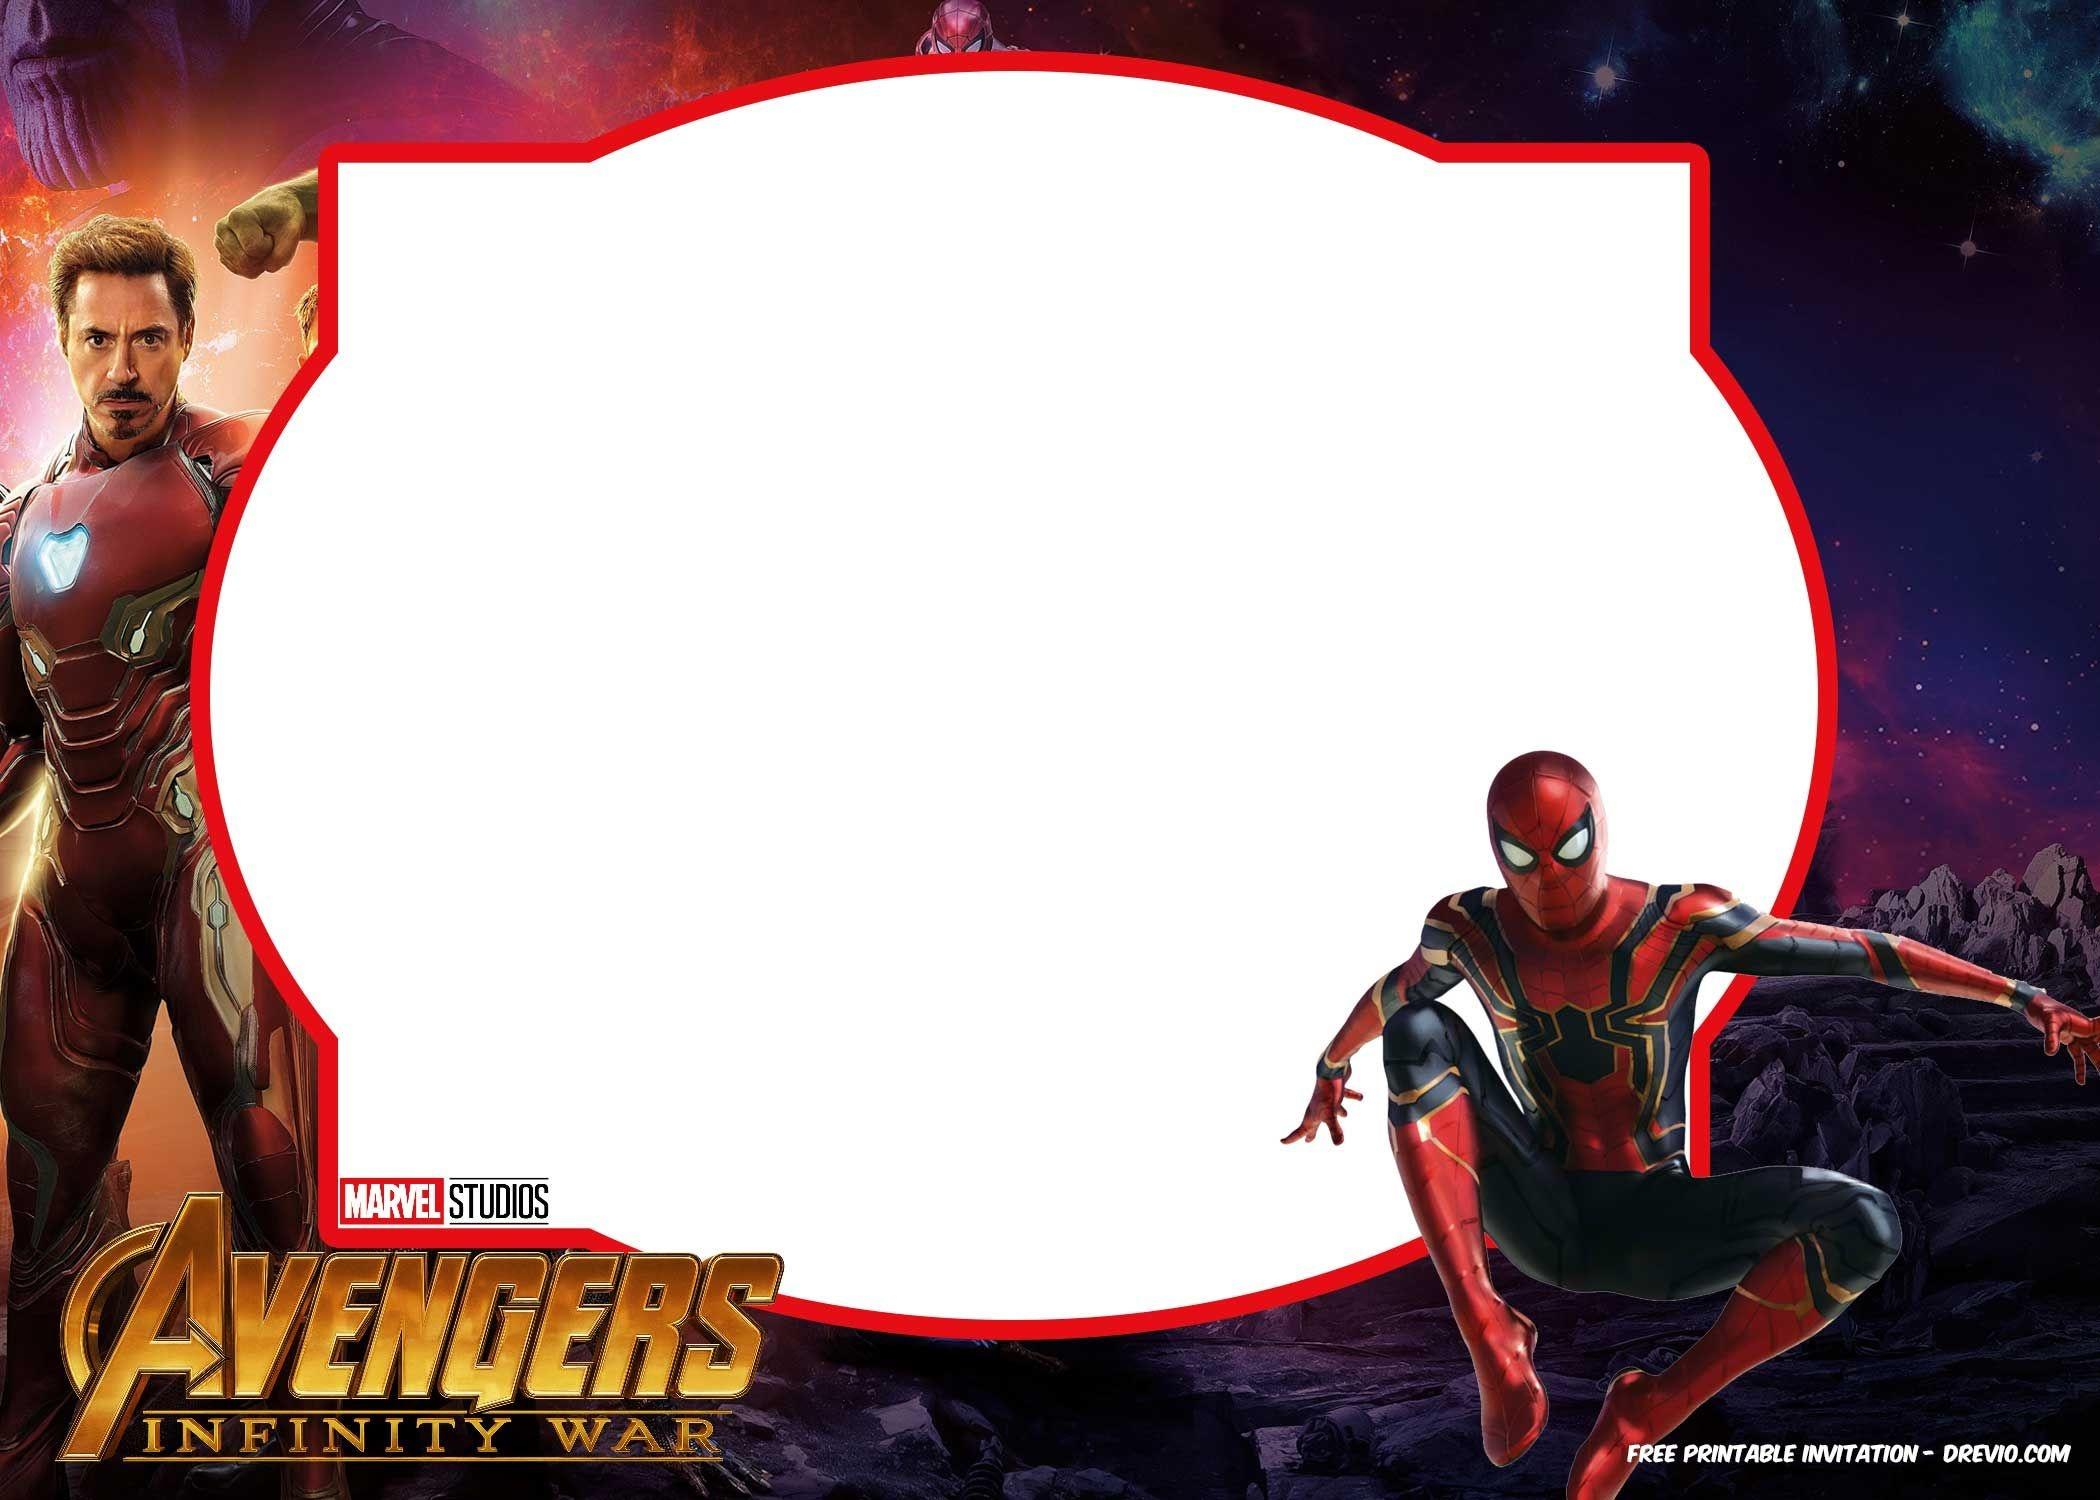 Free Avengers Infinity Wars Birthday Invitation Templates - All - Avengers Party Invitations Printable Free